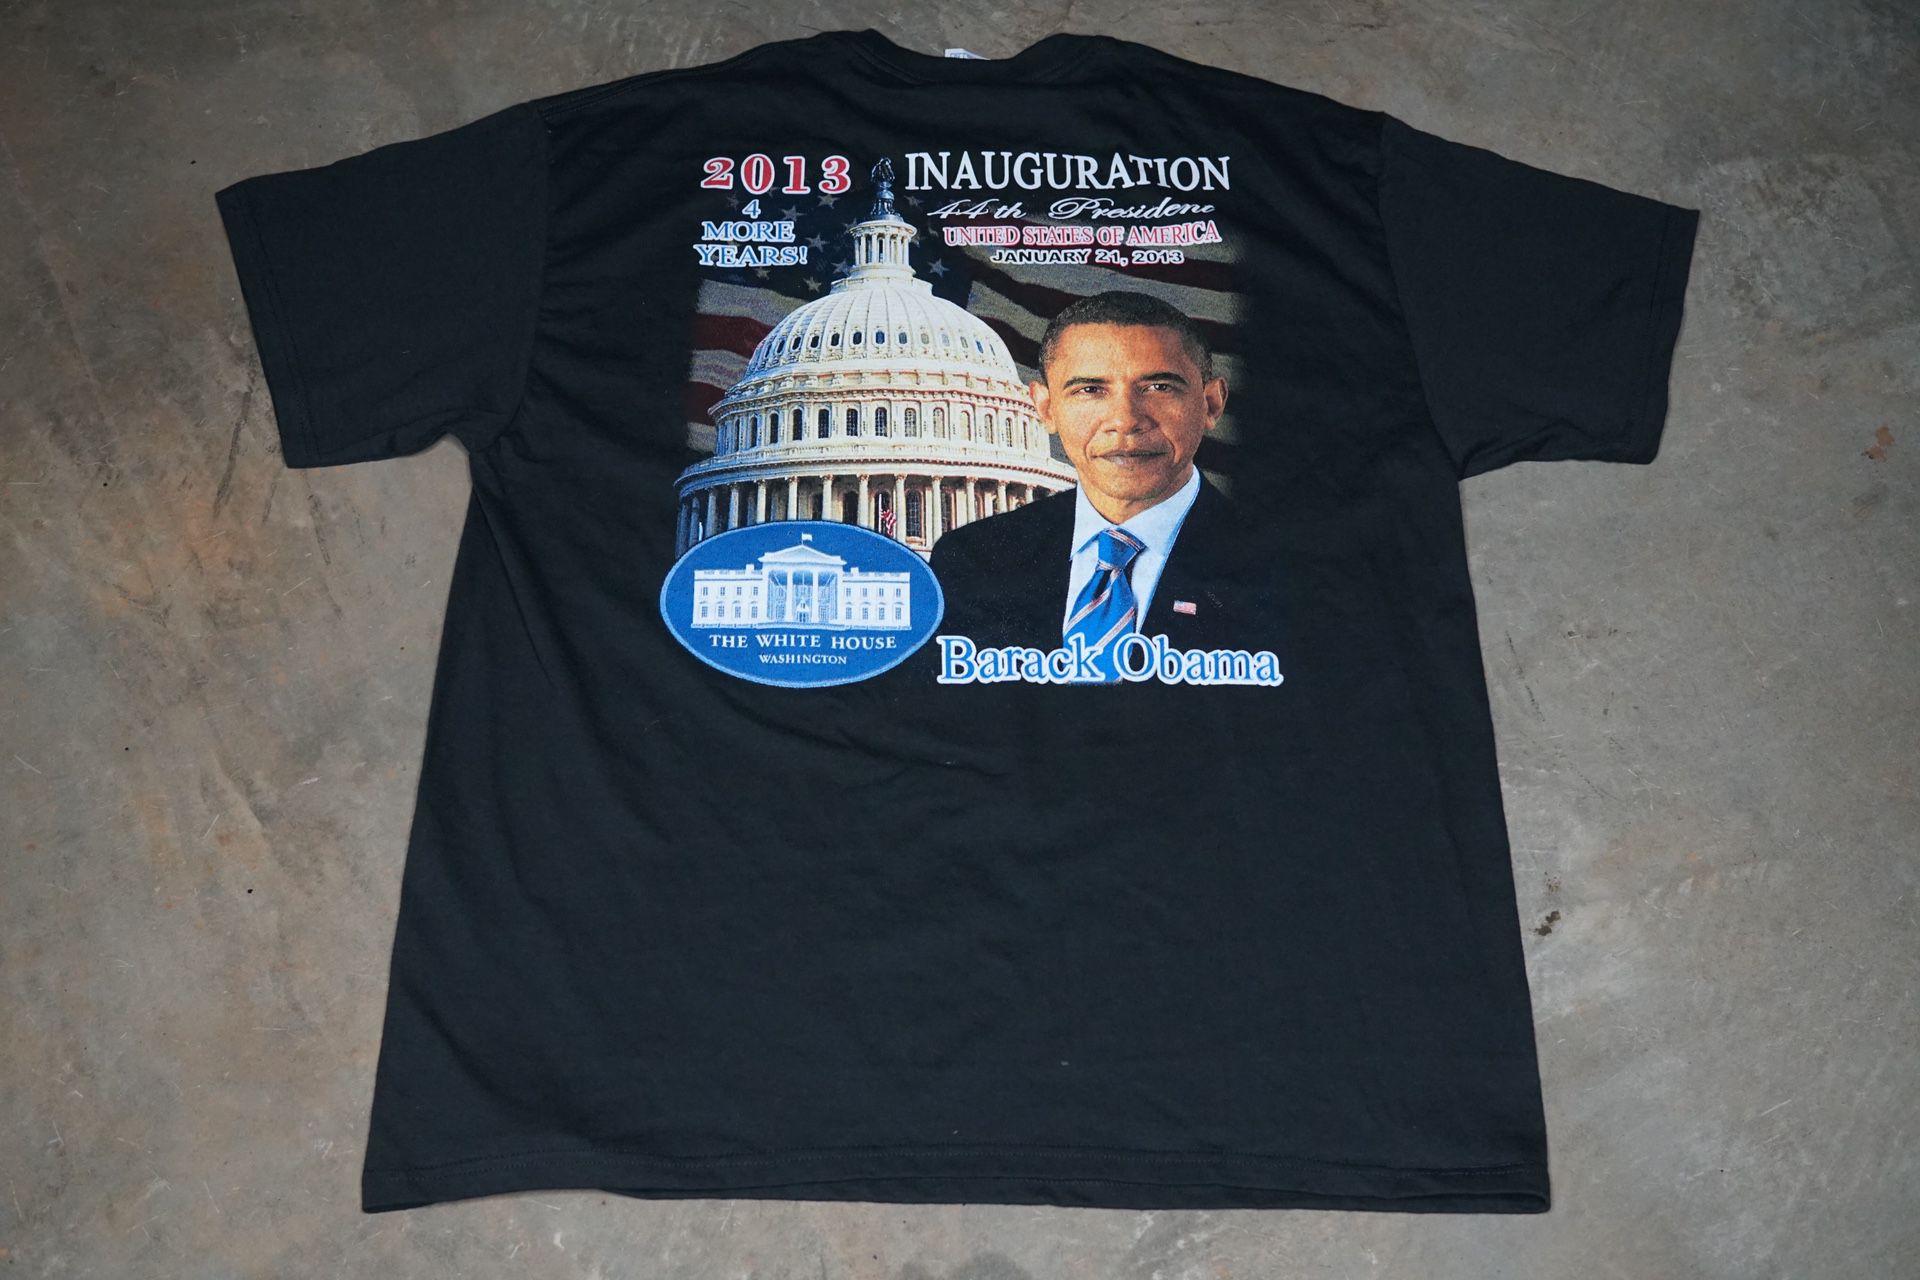 2013 Presidential Inauguration T-Shirt Size XL